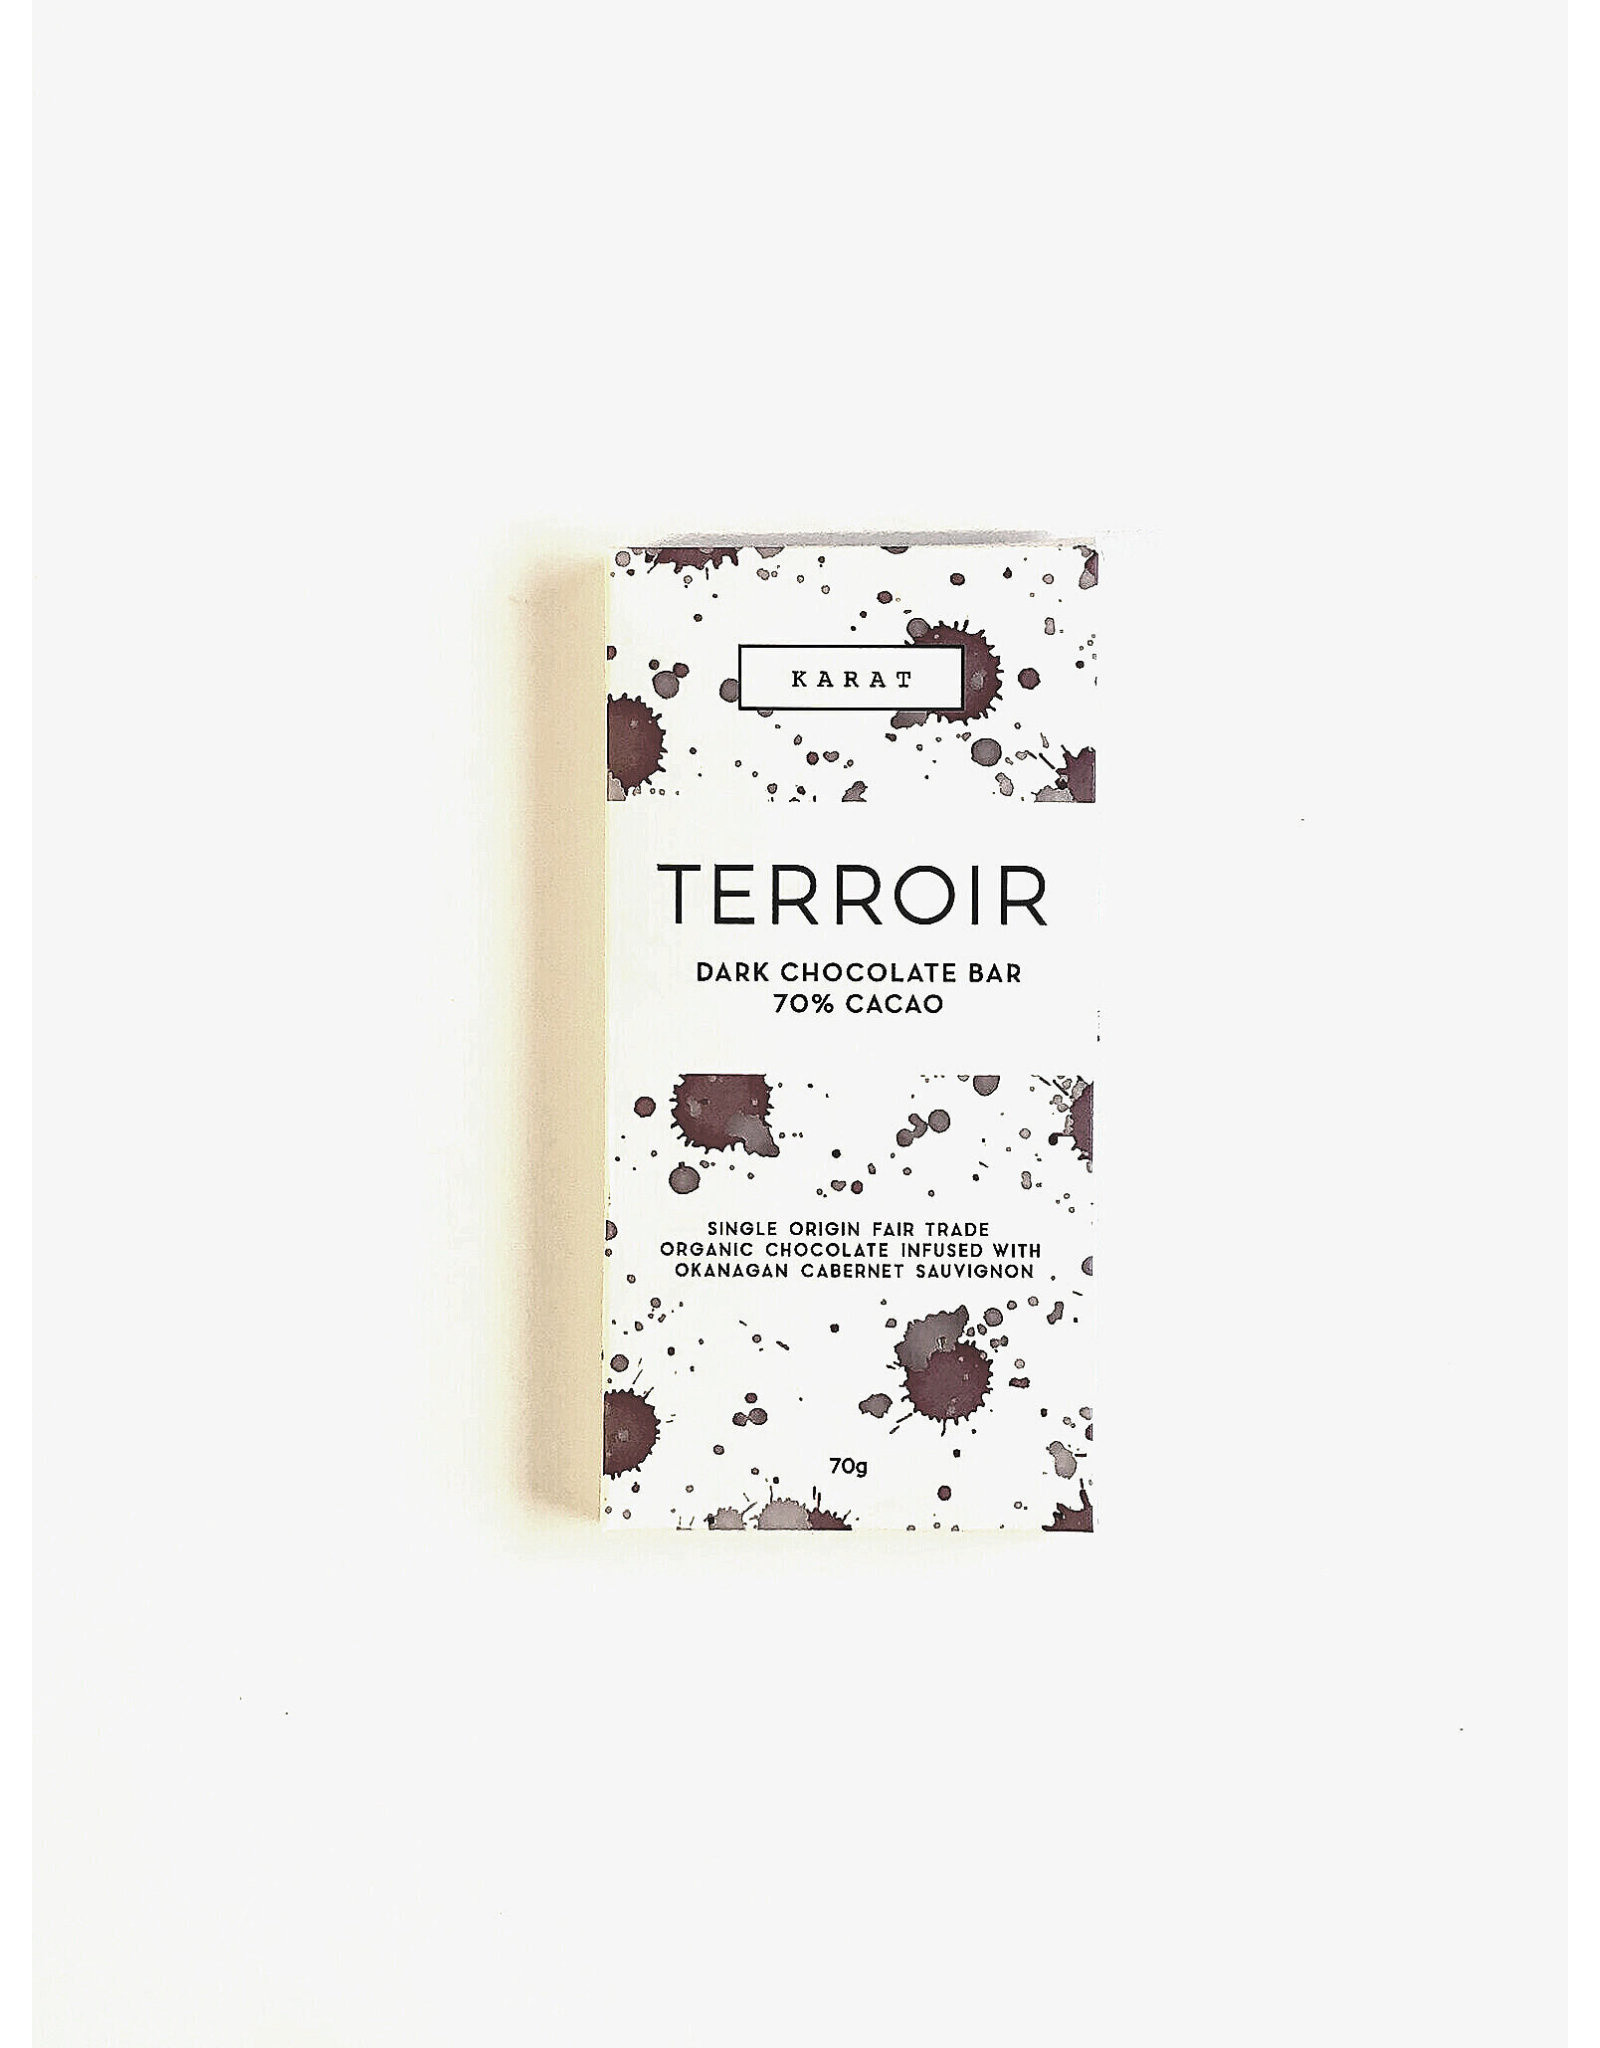 Karat Chocolate Terroir Dark - Chocolate Bar